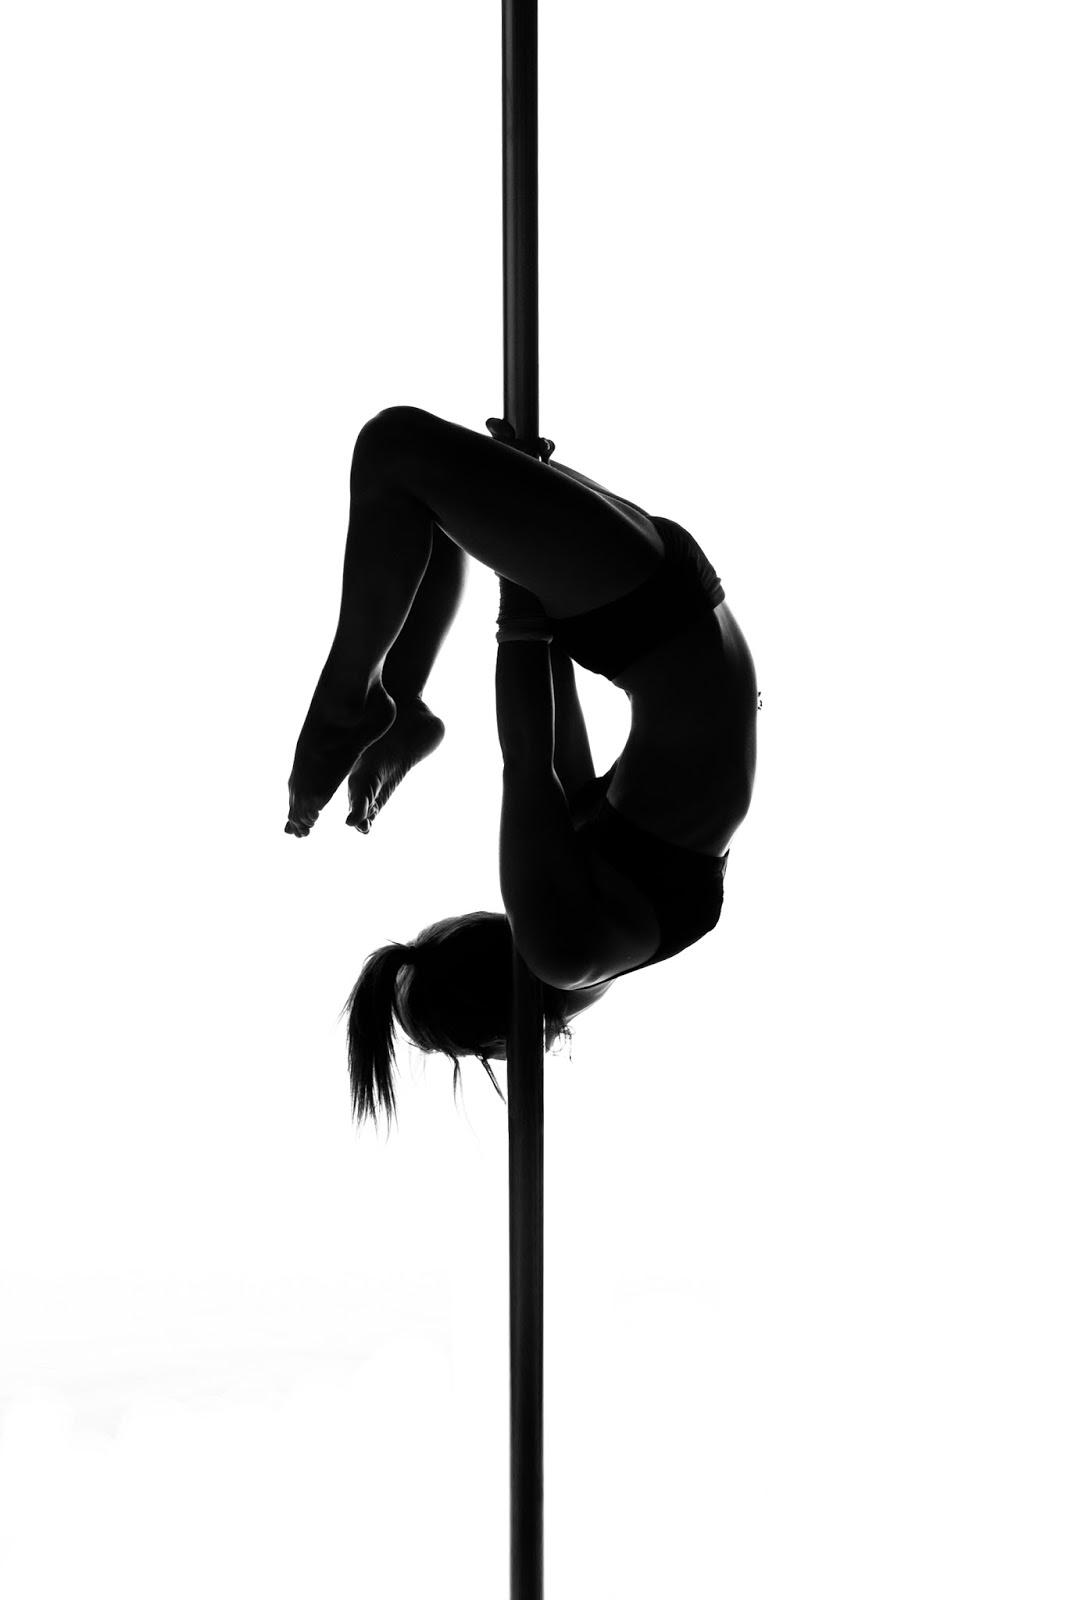 1080x1600 Clip Art Pole Dancer Silhouette Clip Art